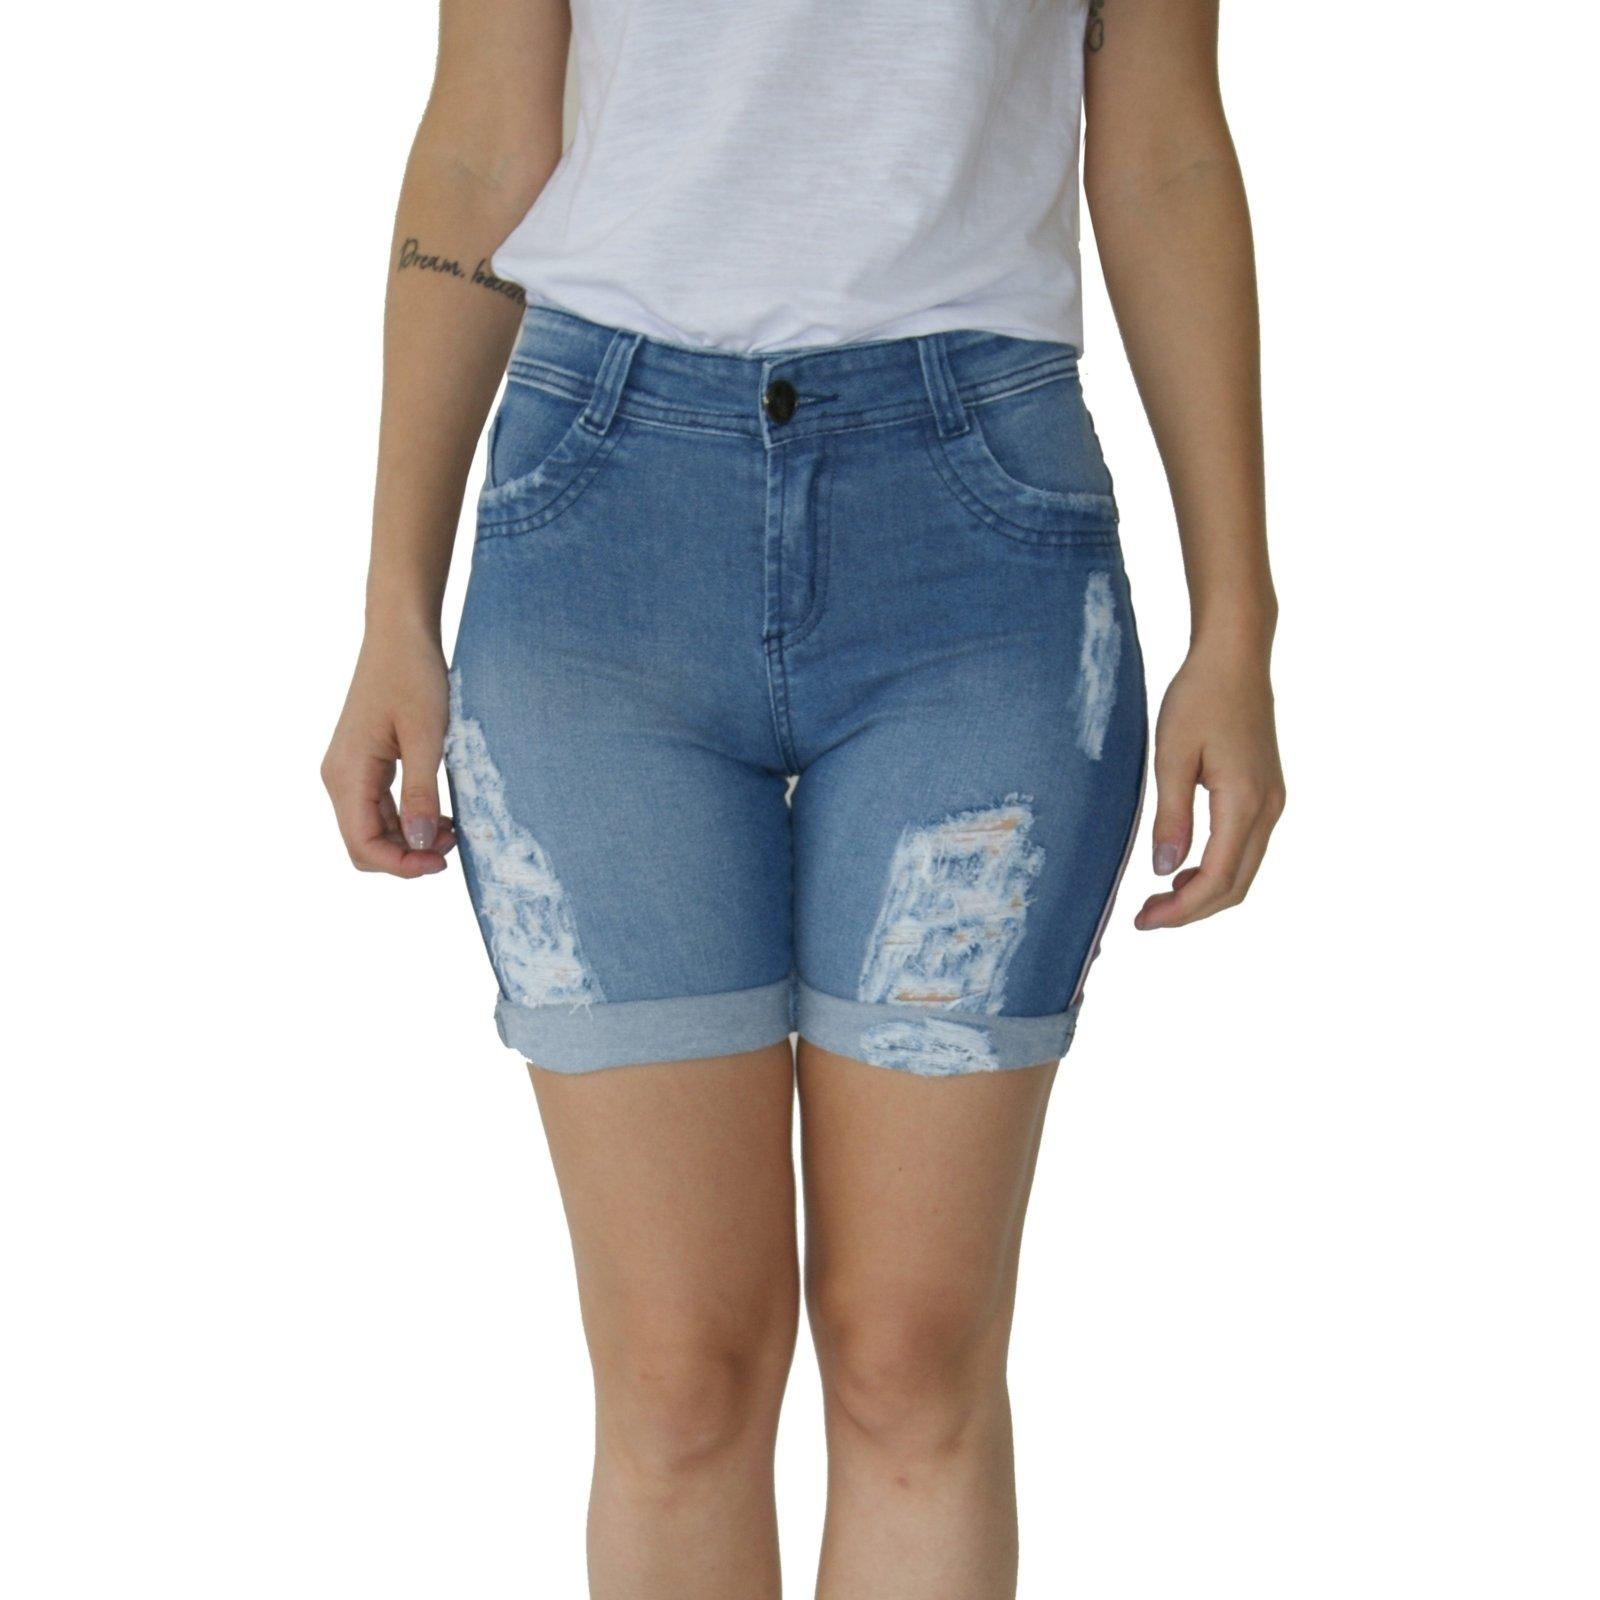 Short Jeans Aero Jeans Azul - Marca Aero Jeans